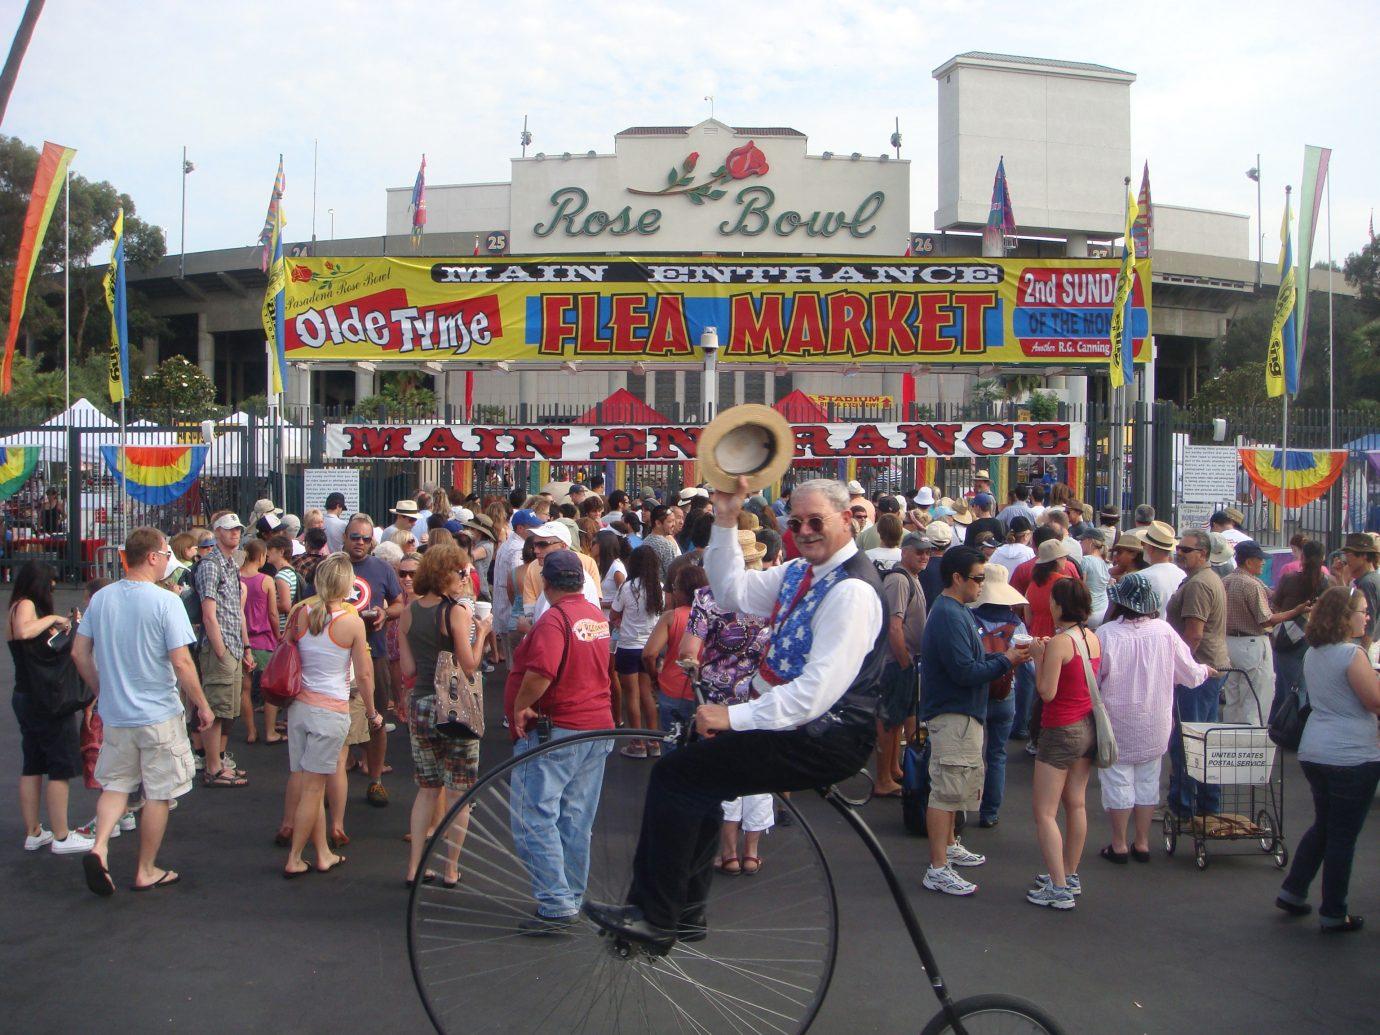 Trip Ideas sky person outdoor people crowd Sport fair festival event carnival parade